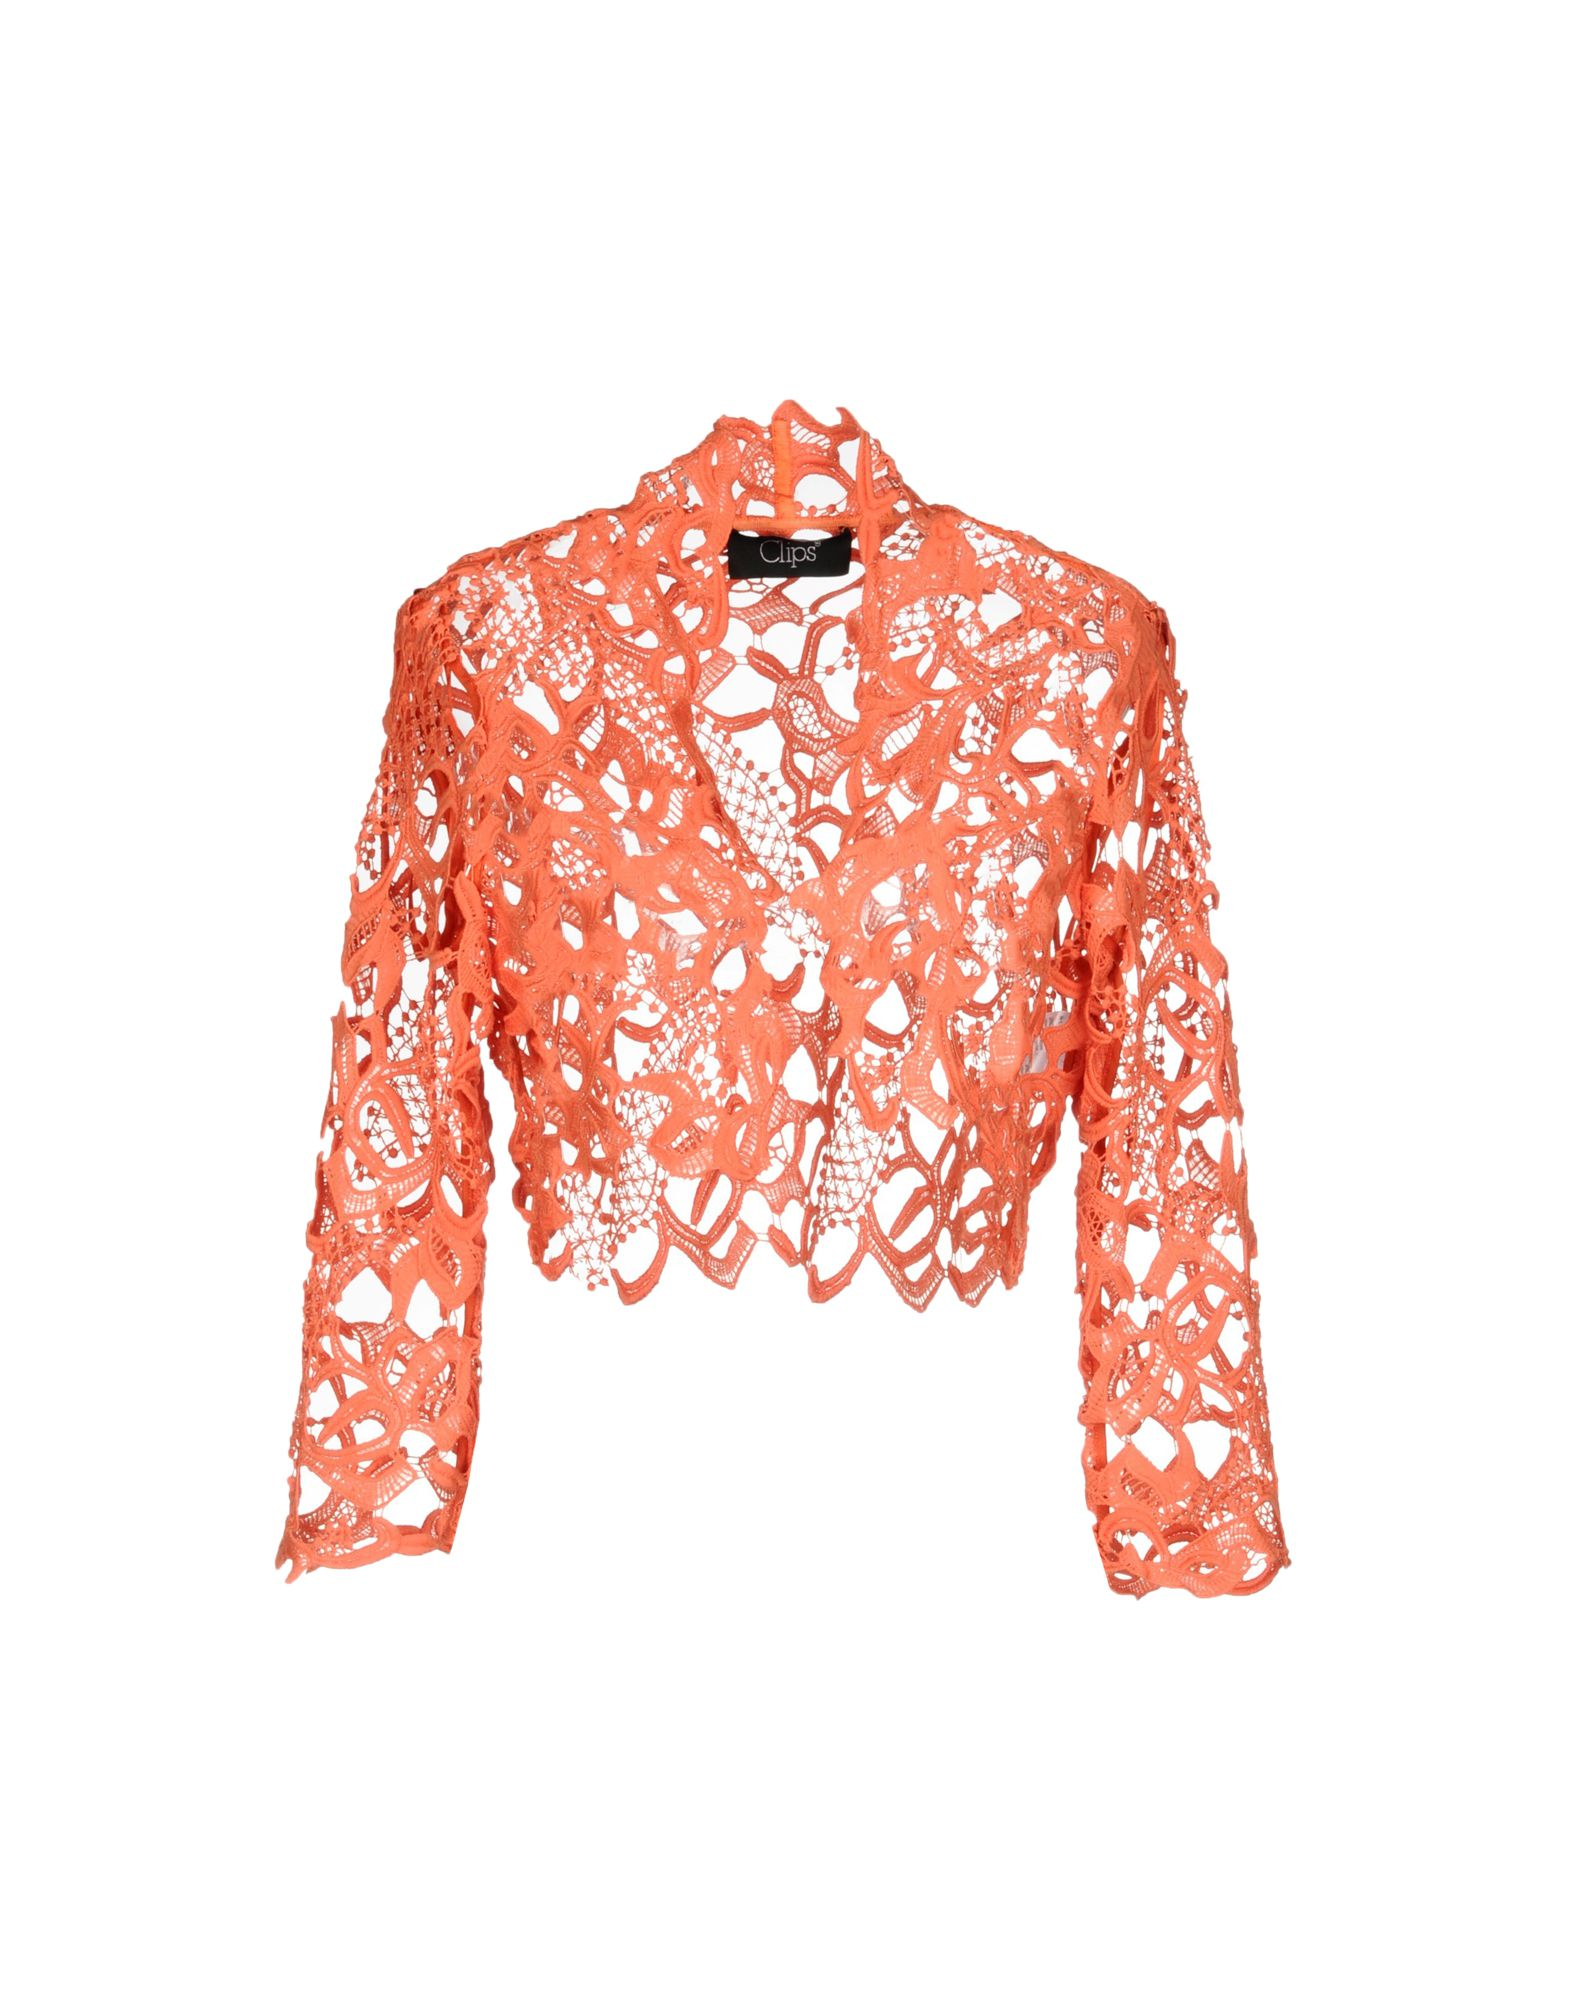 CLIPS Damen Bolero Farbe Orange Größe 5